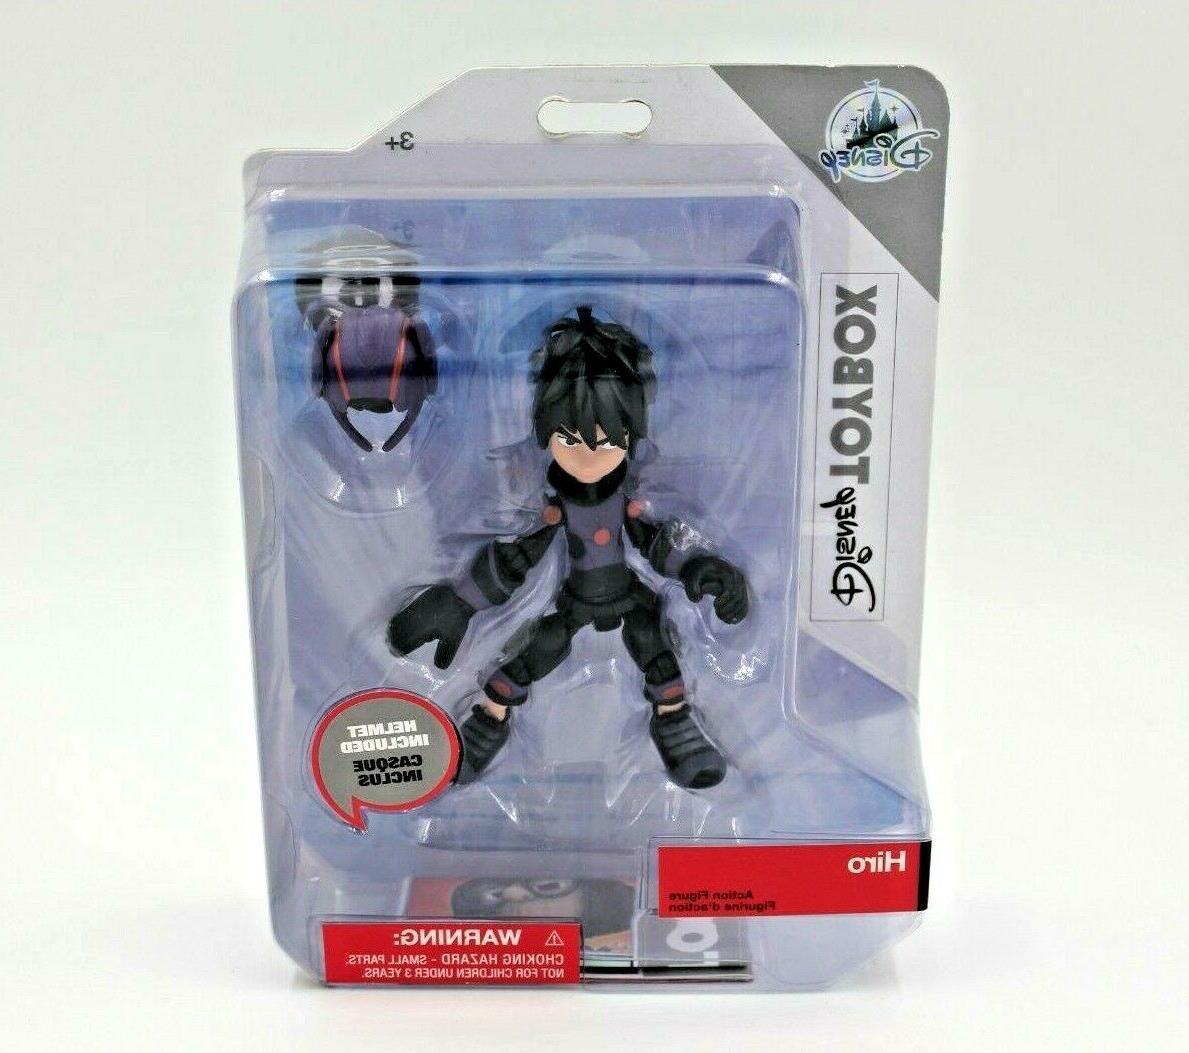 toybox hiro big hero 6 action figure